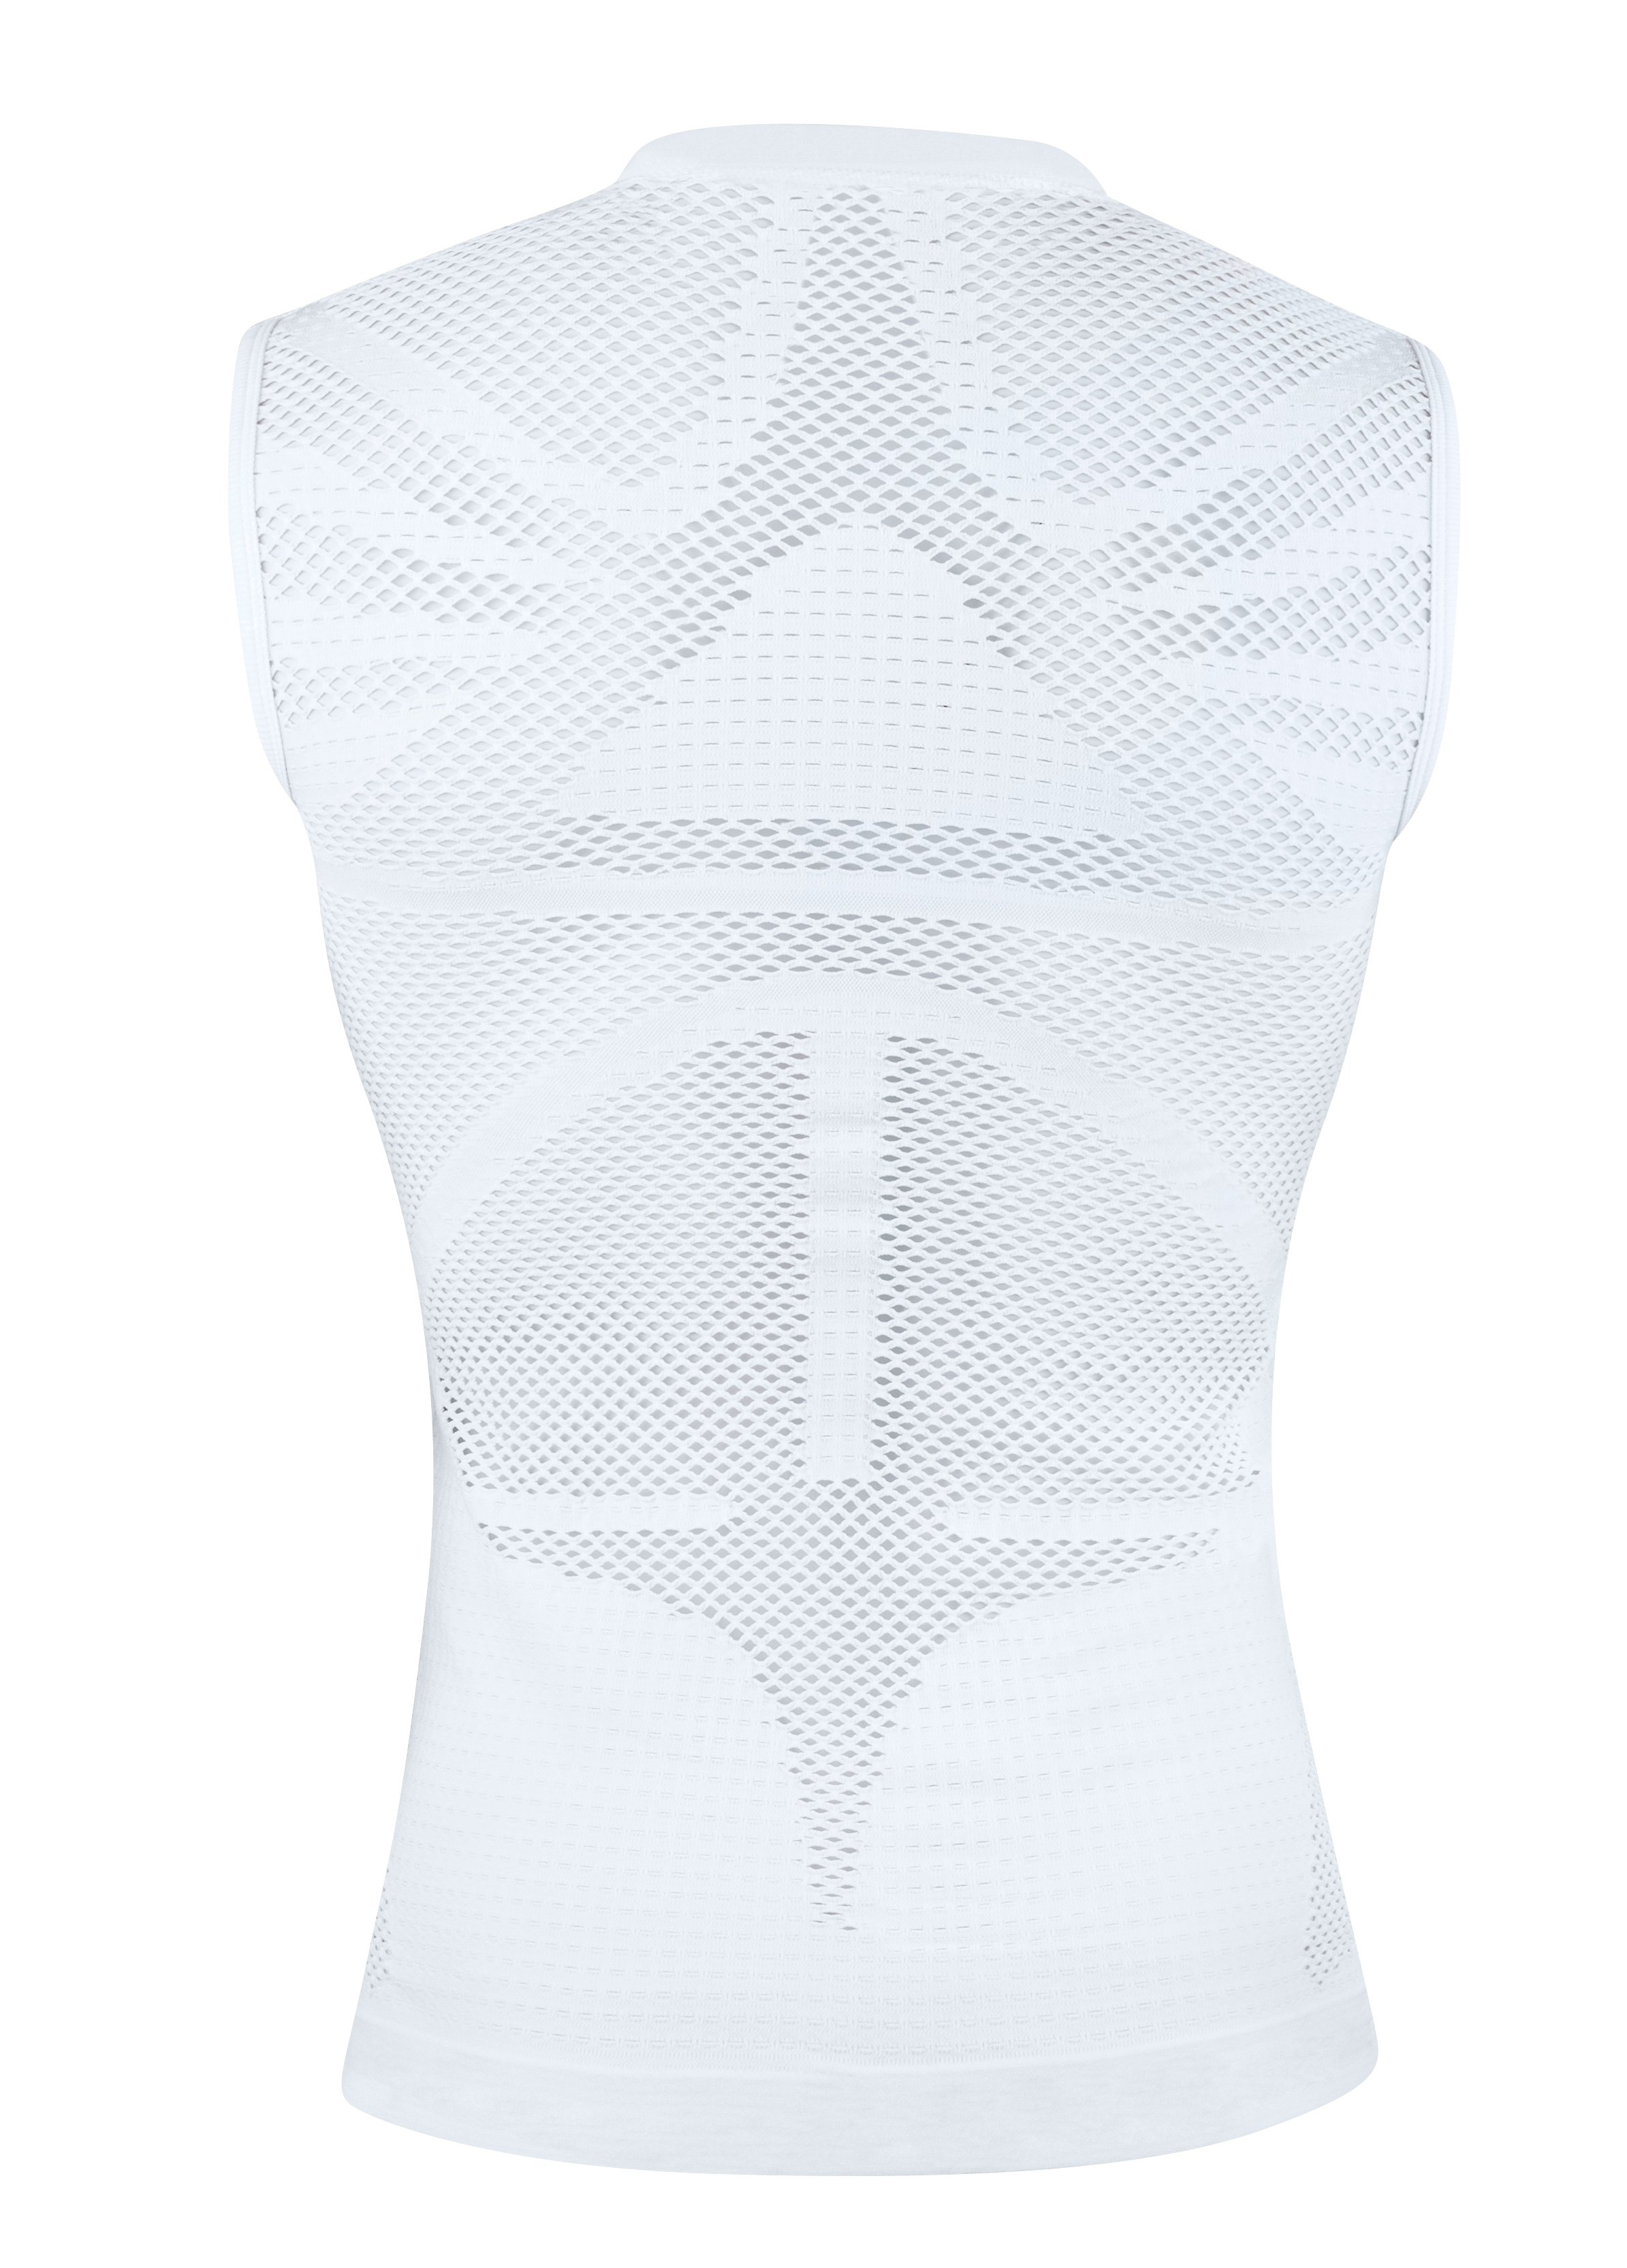 triko funkční F TROPIC bez rukávů,bílé 2XL-3XL